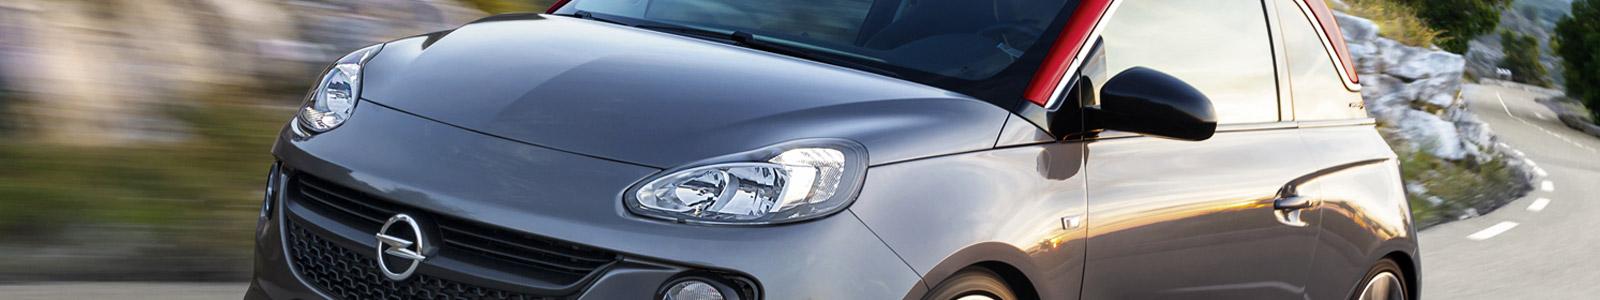 Opel Neuwagen bei Auto Engleder in Hofkirchen